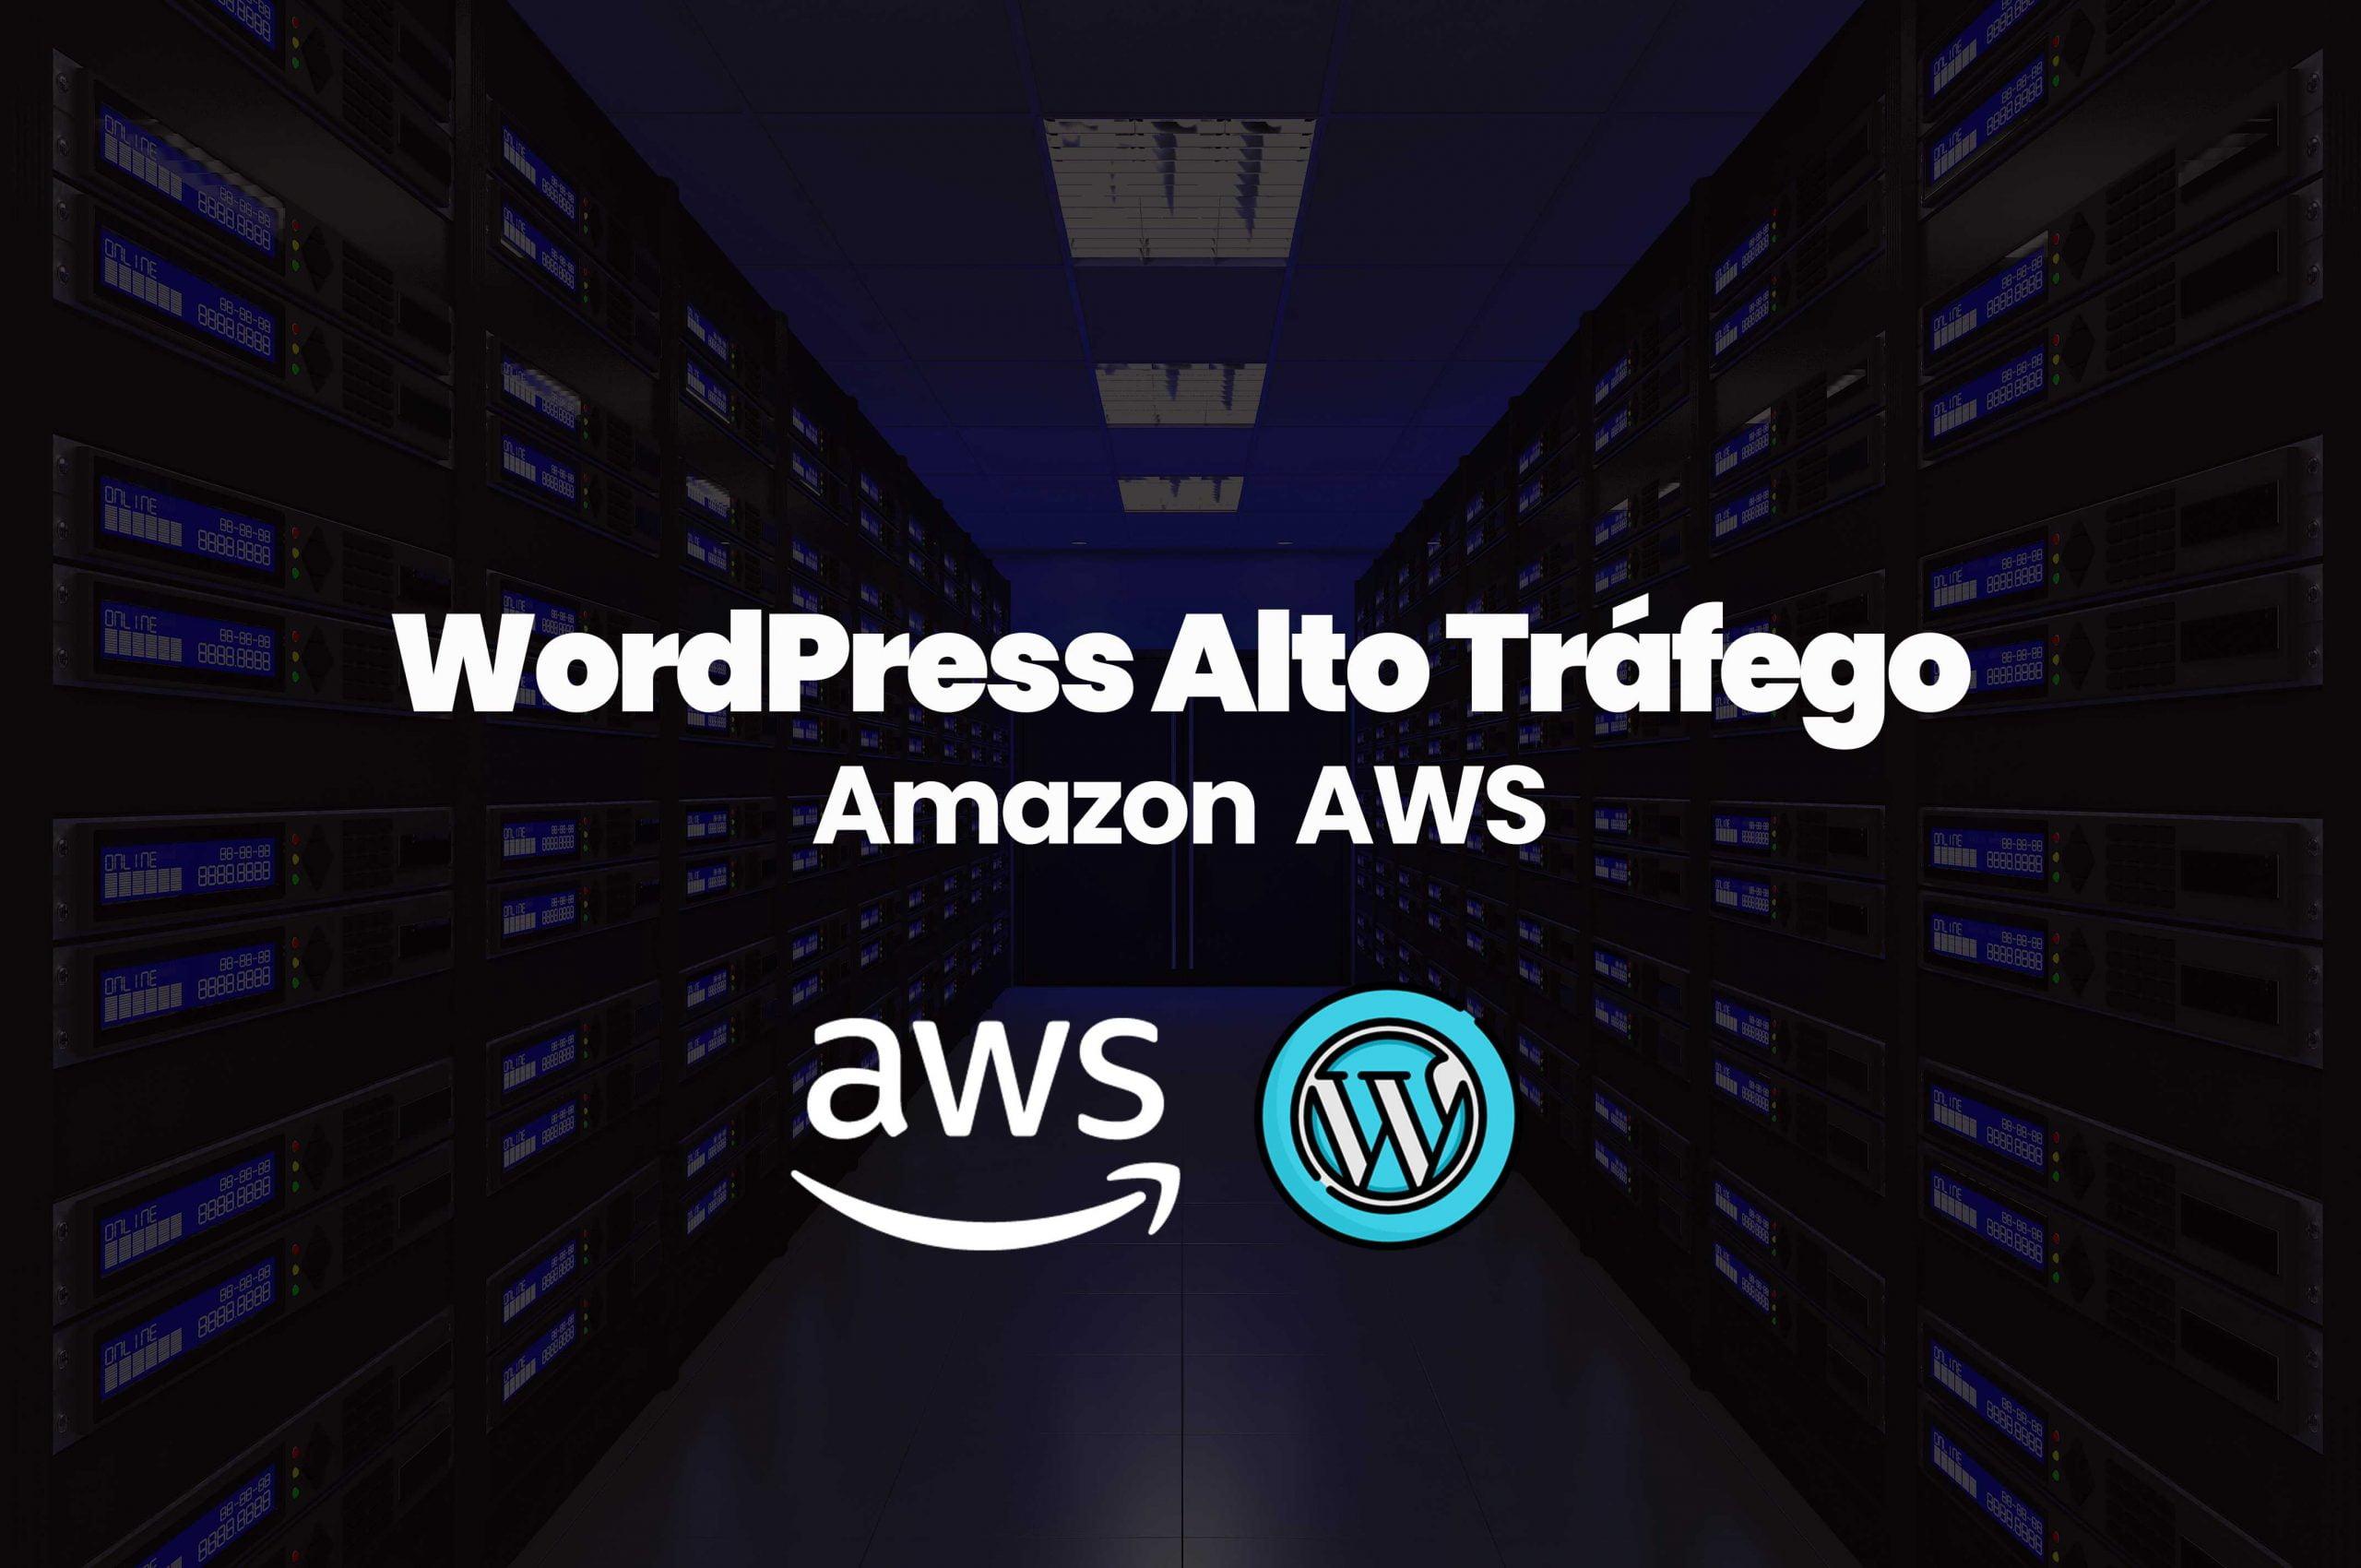 hospedagem-wordpress-alto-trafego-alexfreelancer-amazon-aws-01